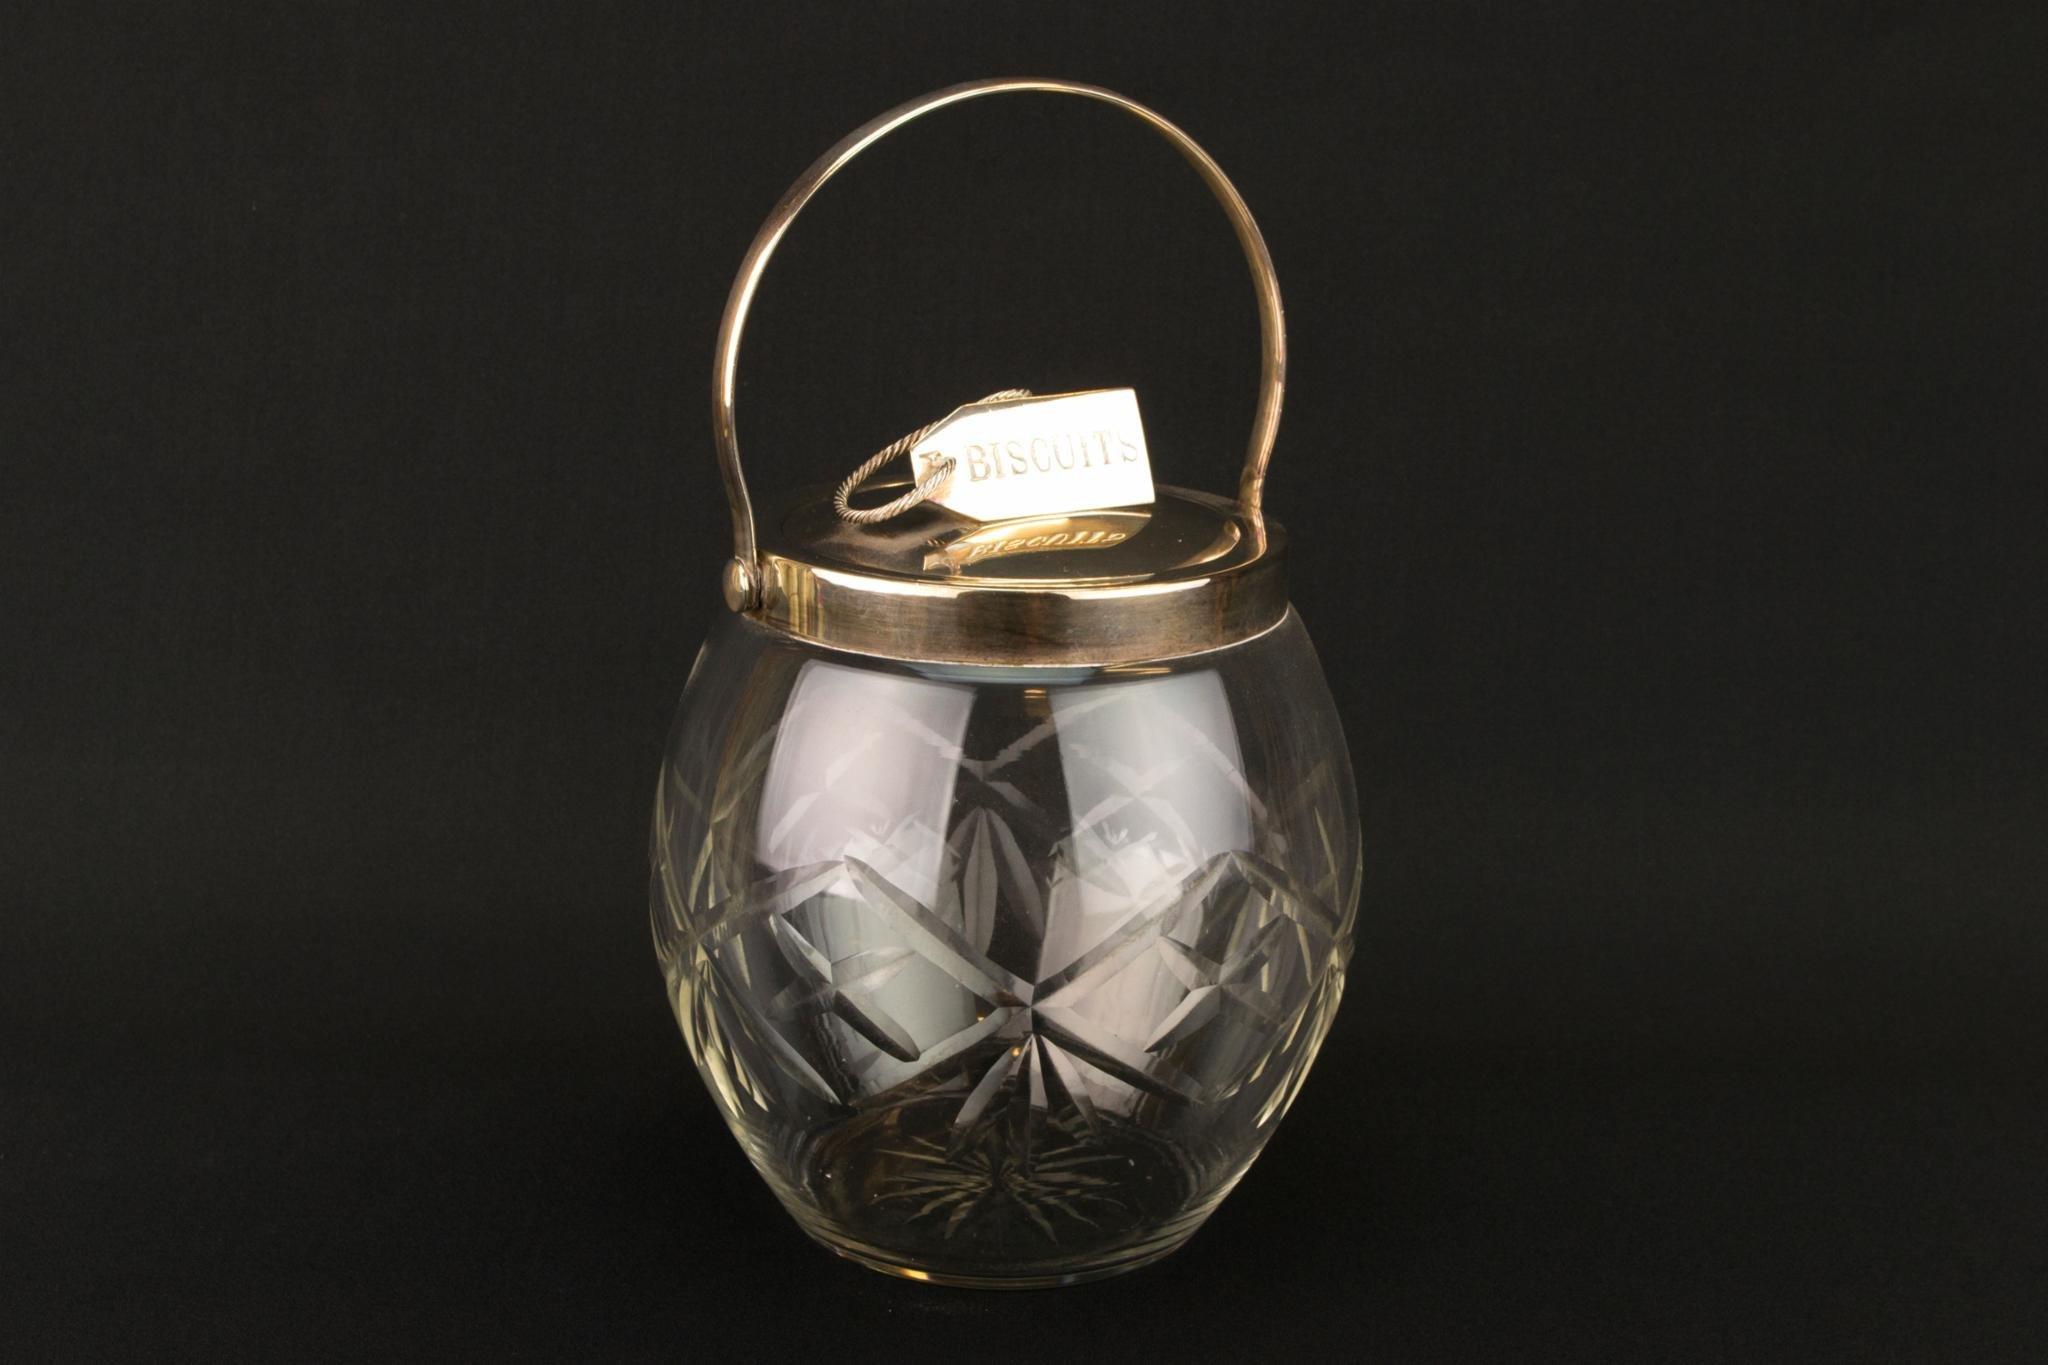 Cut Glass Kitchen Storage Jar Silver Plated Mounts Biscuit Barrel Shaped Vintage English 1920s